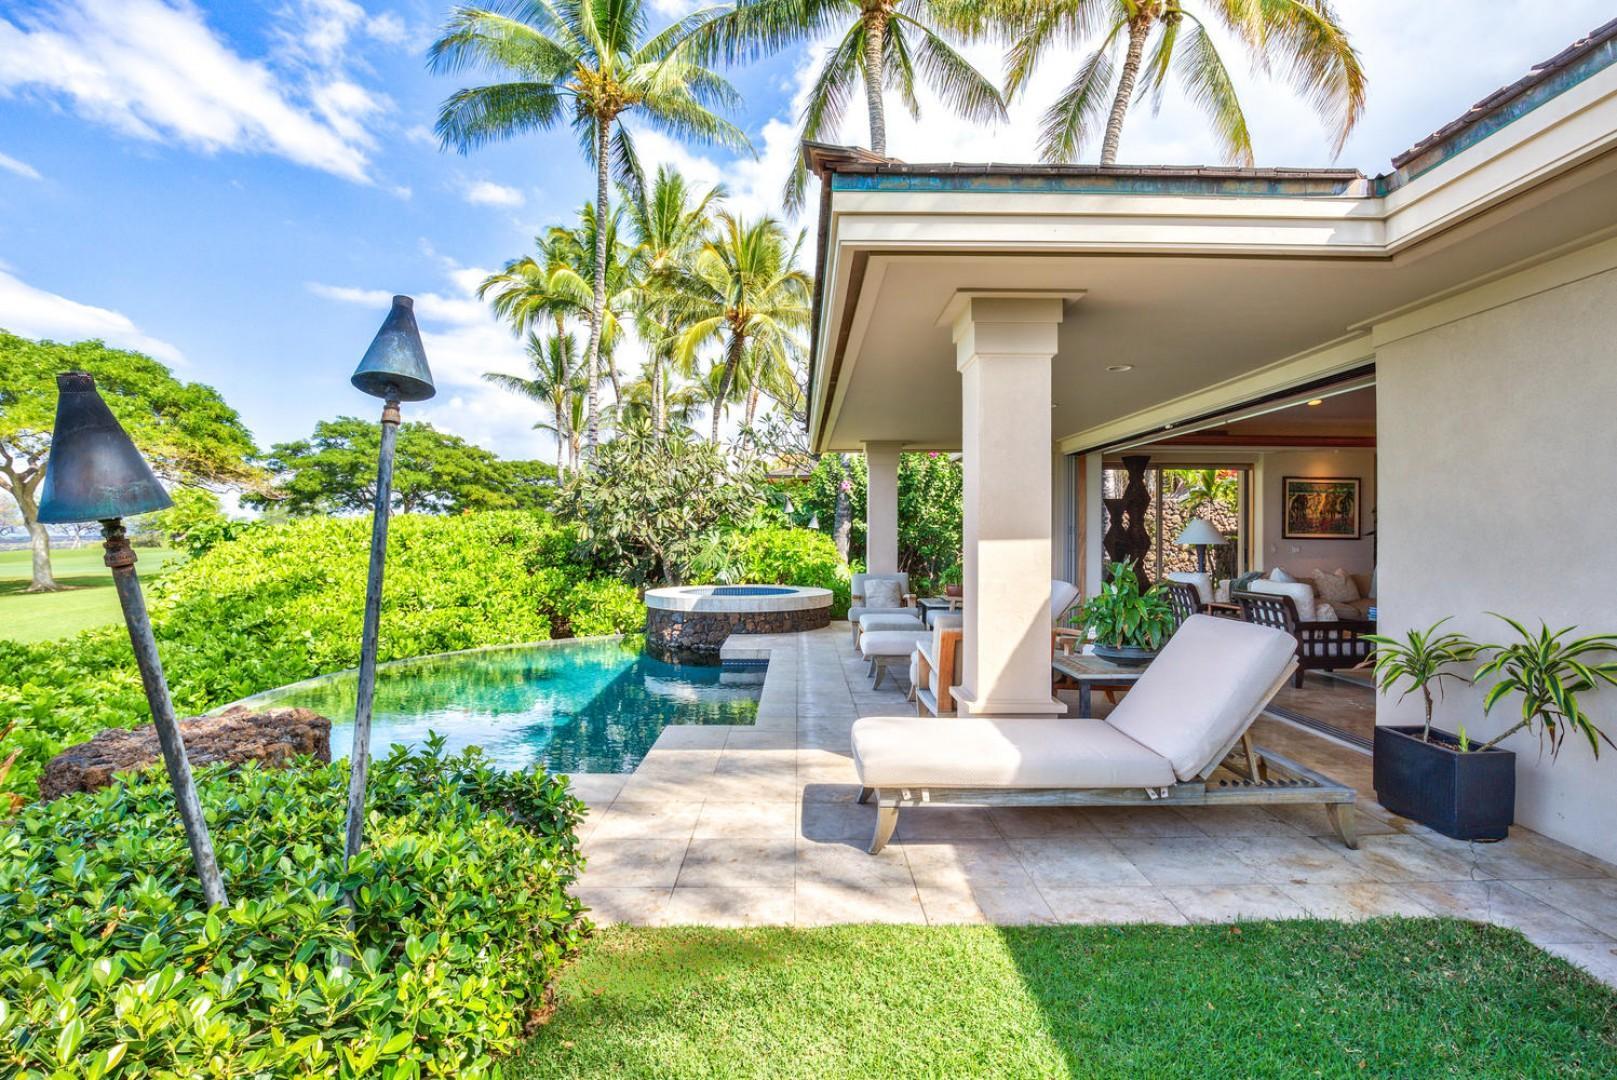 Pool deck w/ocean-view infinity pool, private spa & tiki torches.